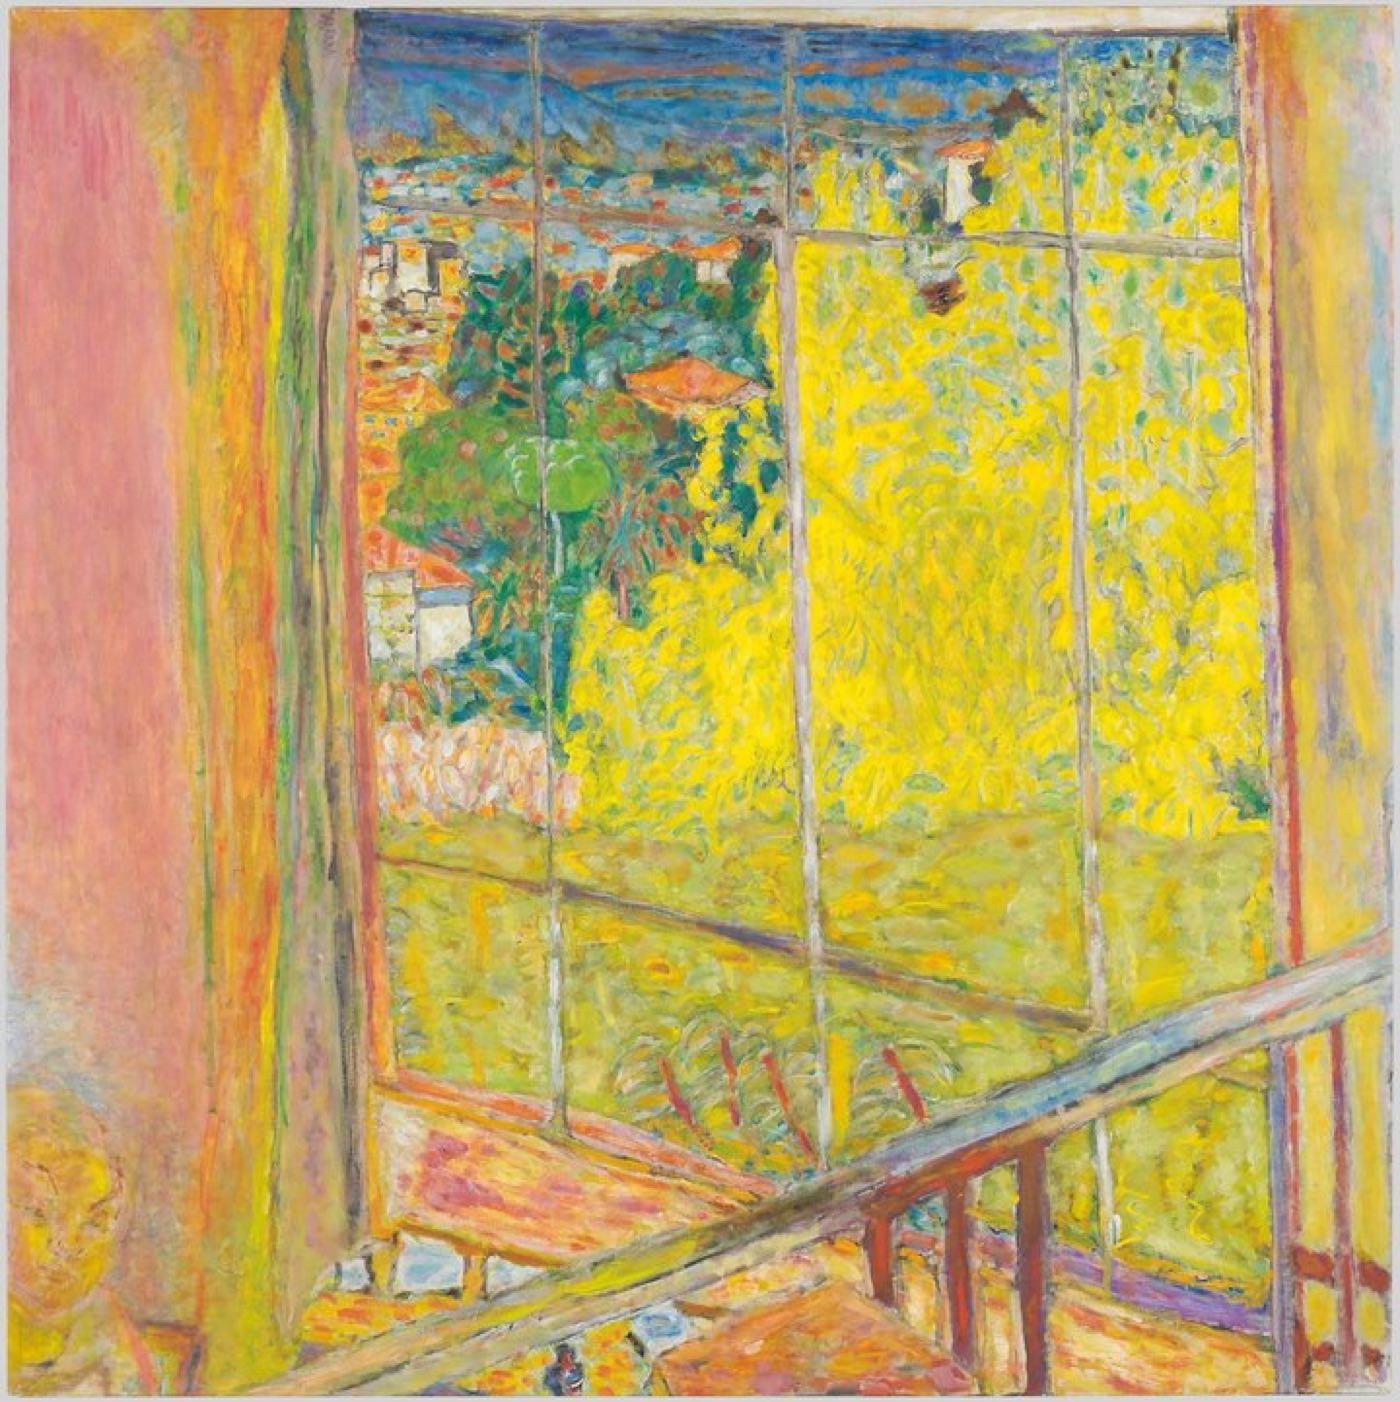 pierre_bonnard_the_studio_with_mimosa_1939-46_oil_paint_on_canvas_127.5_x_127.5_cm_-_photo_c_centre_pompidou_mnam-cci_dist._rmn-grand_palais_-_c_bertrand_prevost.jpg